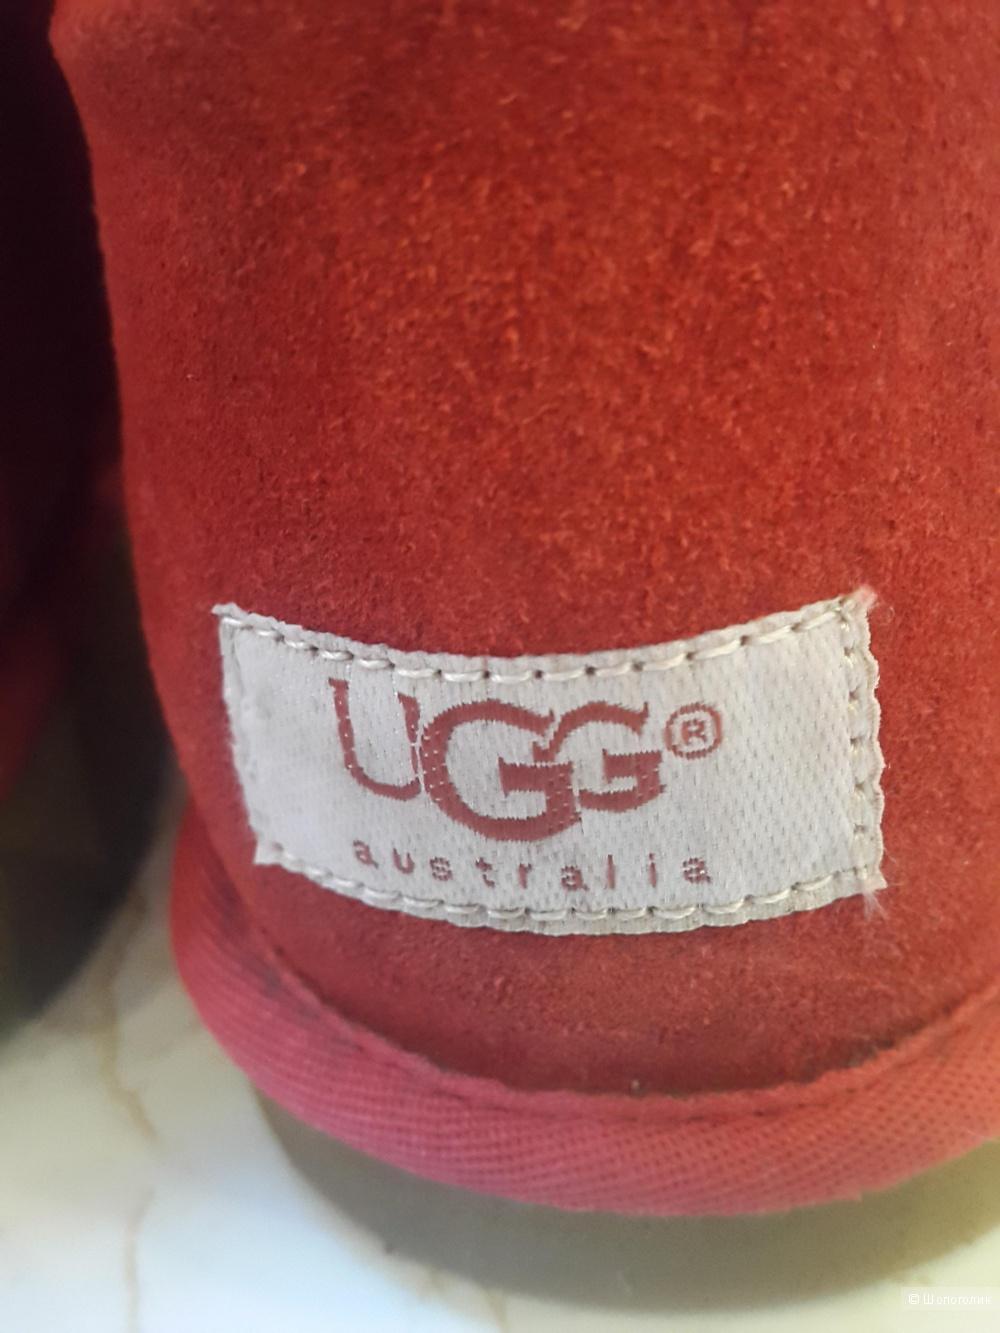 Сапоги Ugg Australia размер W9